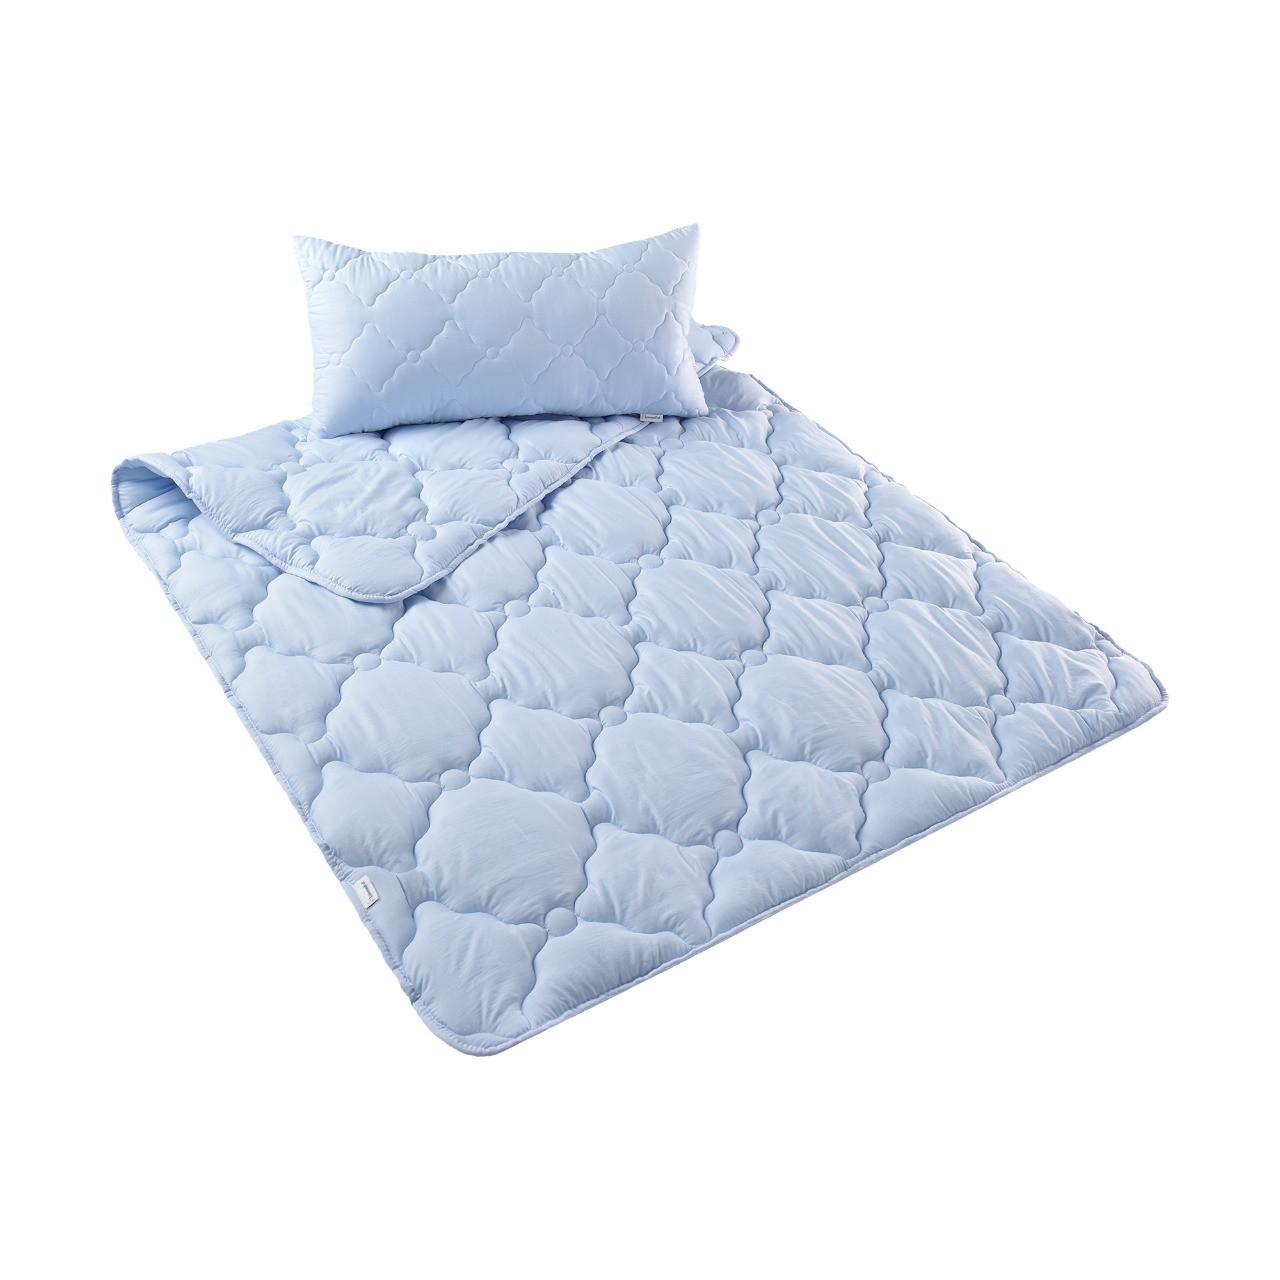 Набор: одеяло холлофайбер всесезонное 200х220 + 2 подушки 50х70 Лаванда IDEIA